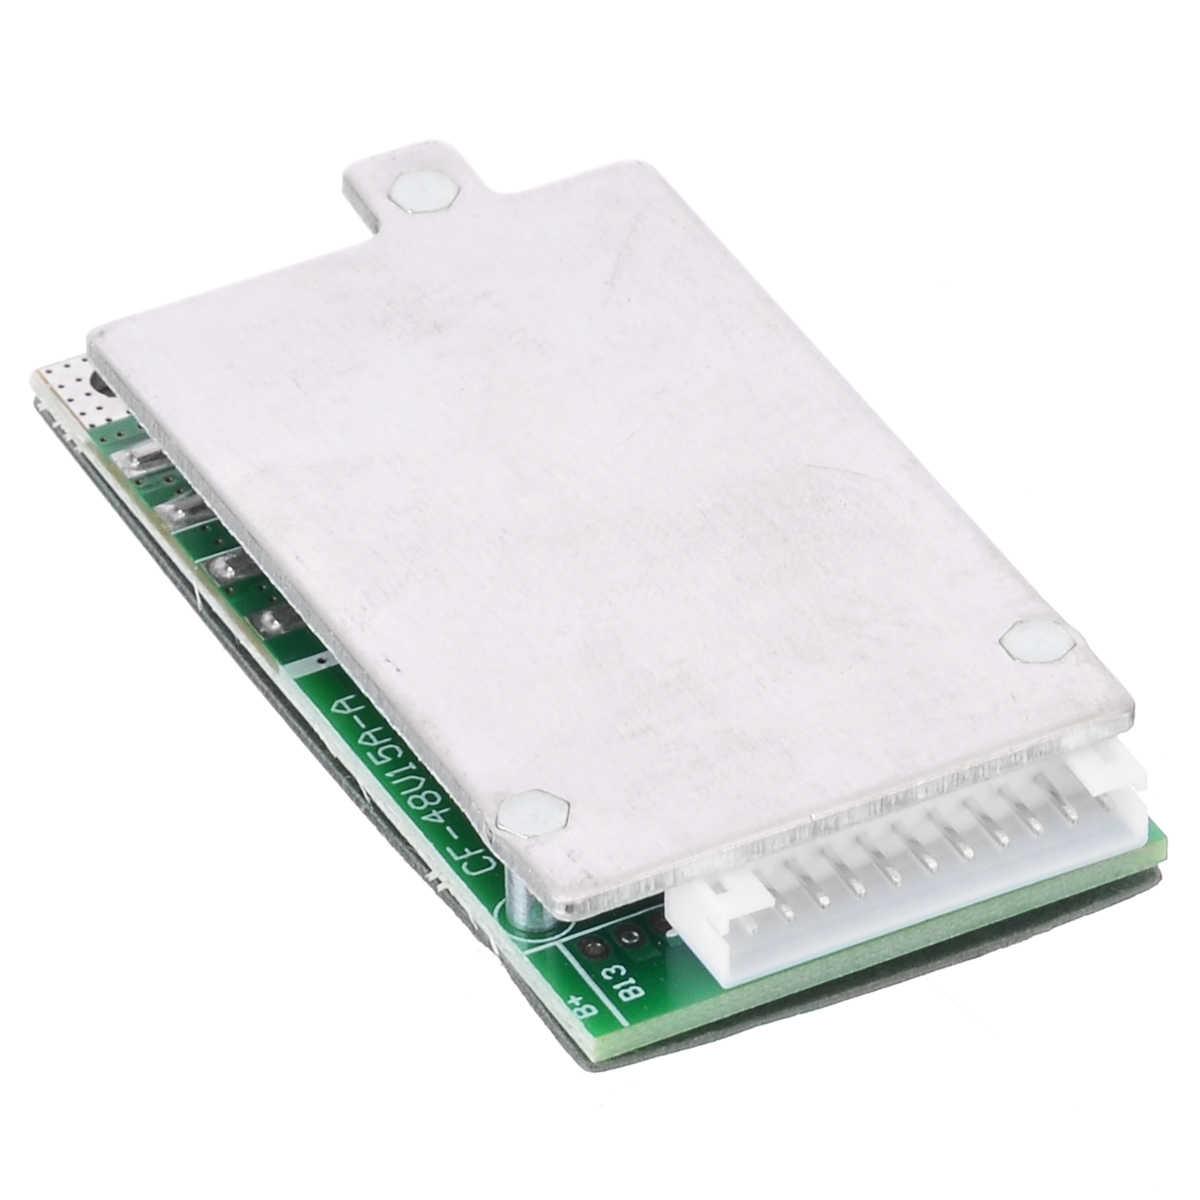 1PC Hoge Kwaliteit Lithium Batterij Bescherming Boord 10S 36V 37V 15A Li-Ion Batterij BMS PCB PCM Mayitr